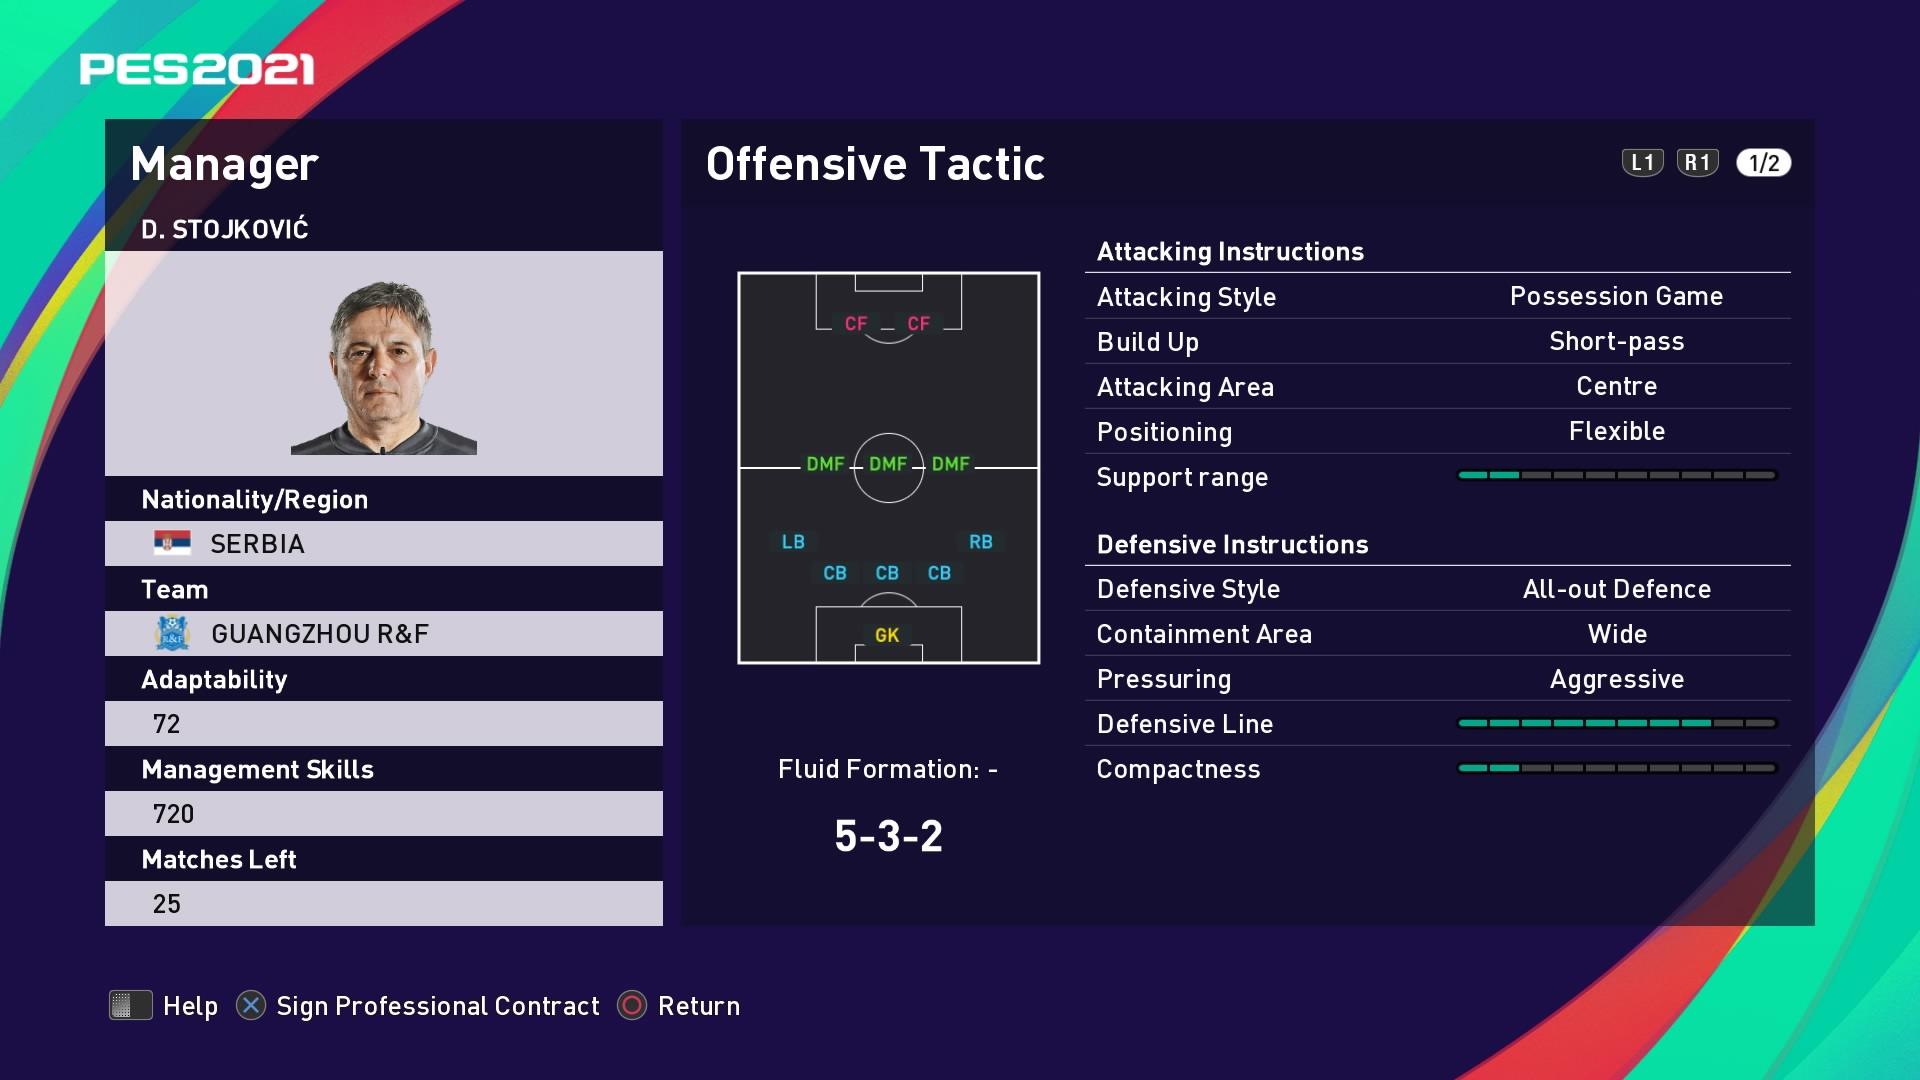 D. Stojković (Dragan Stojković) Offensive Tactic in PES 2021 myClub